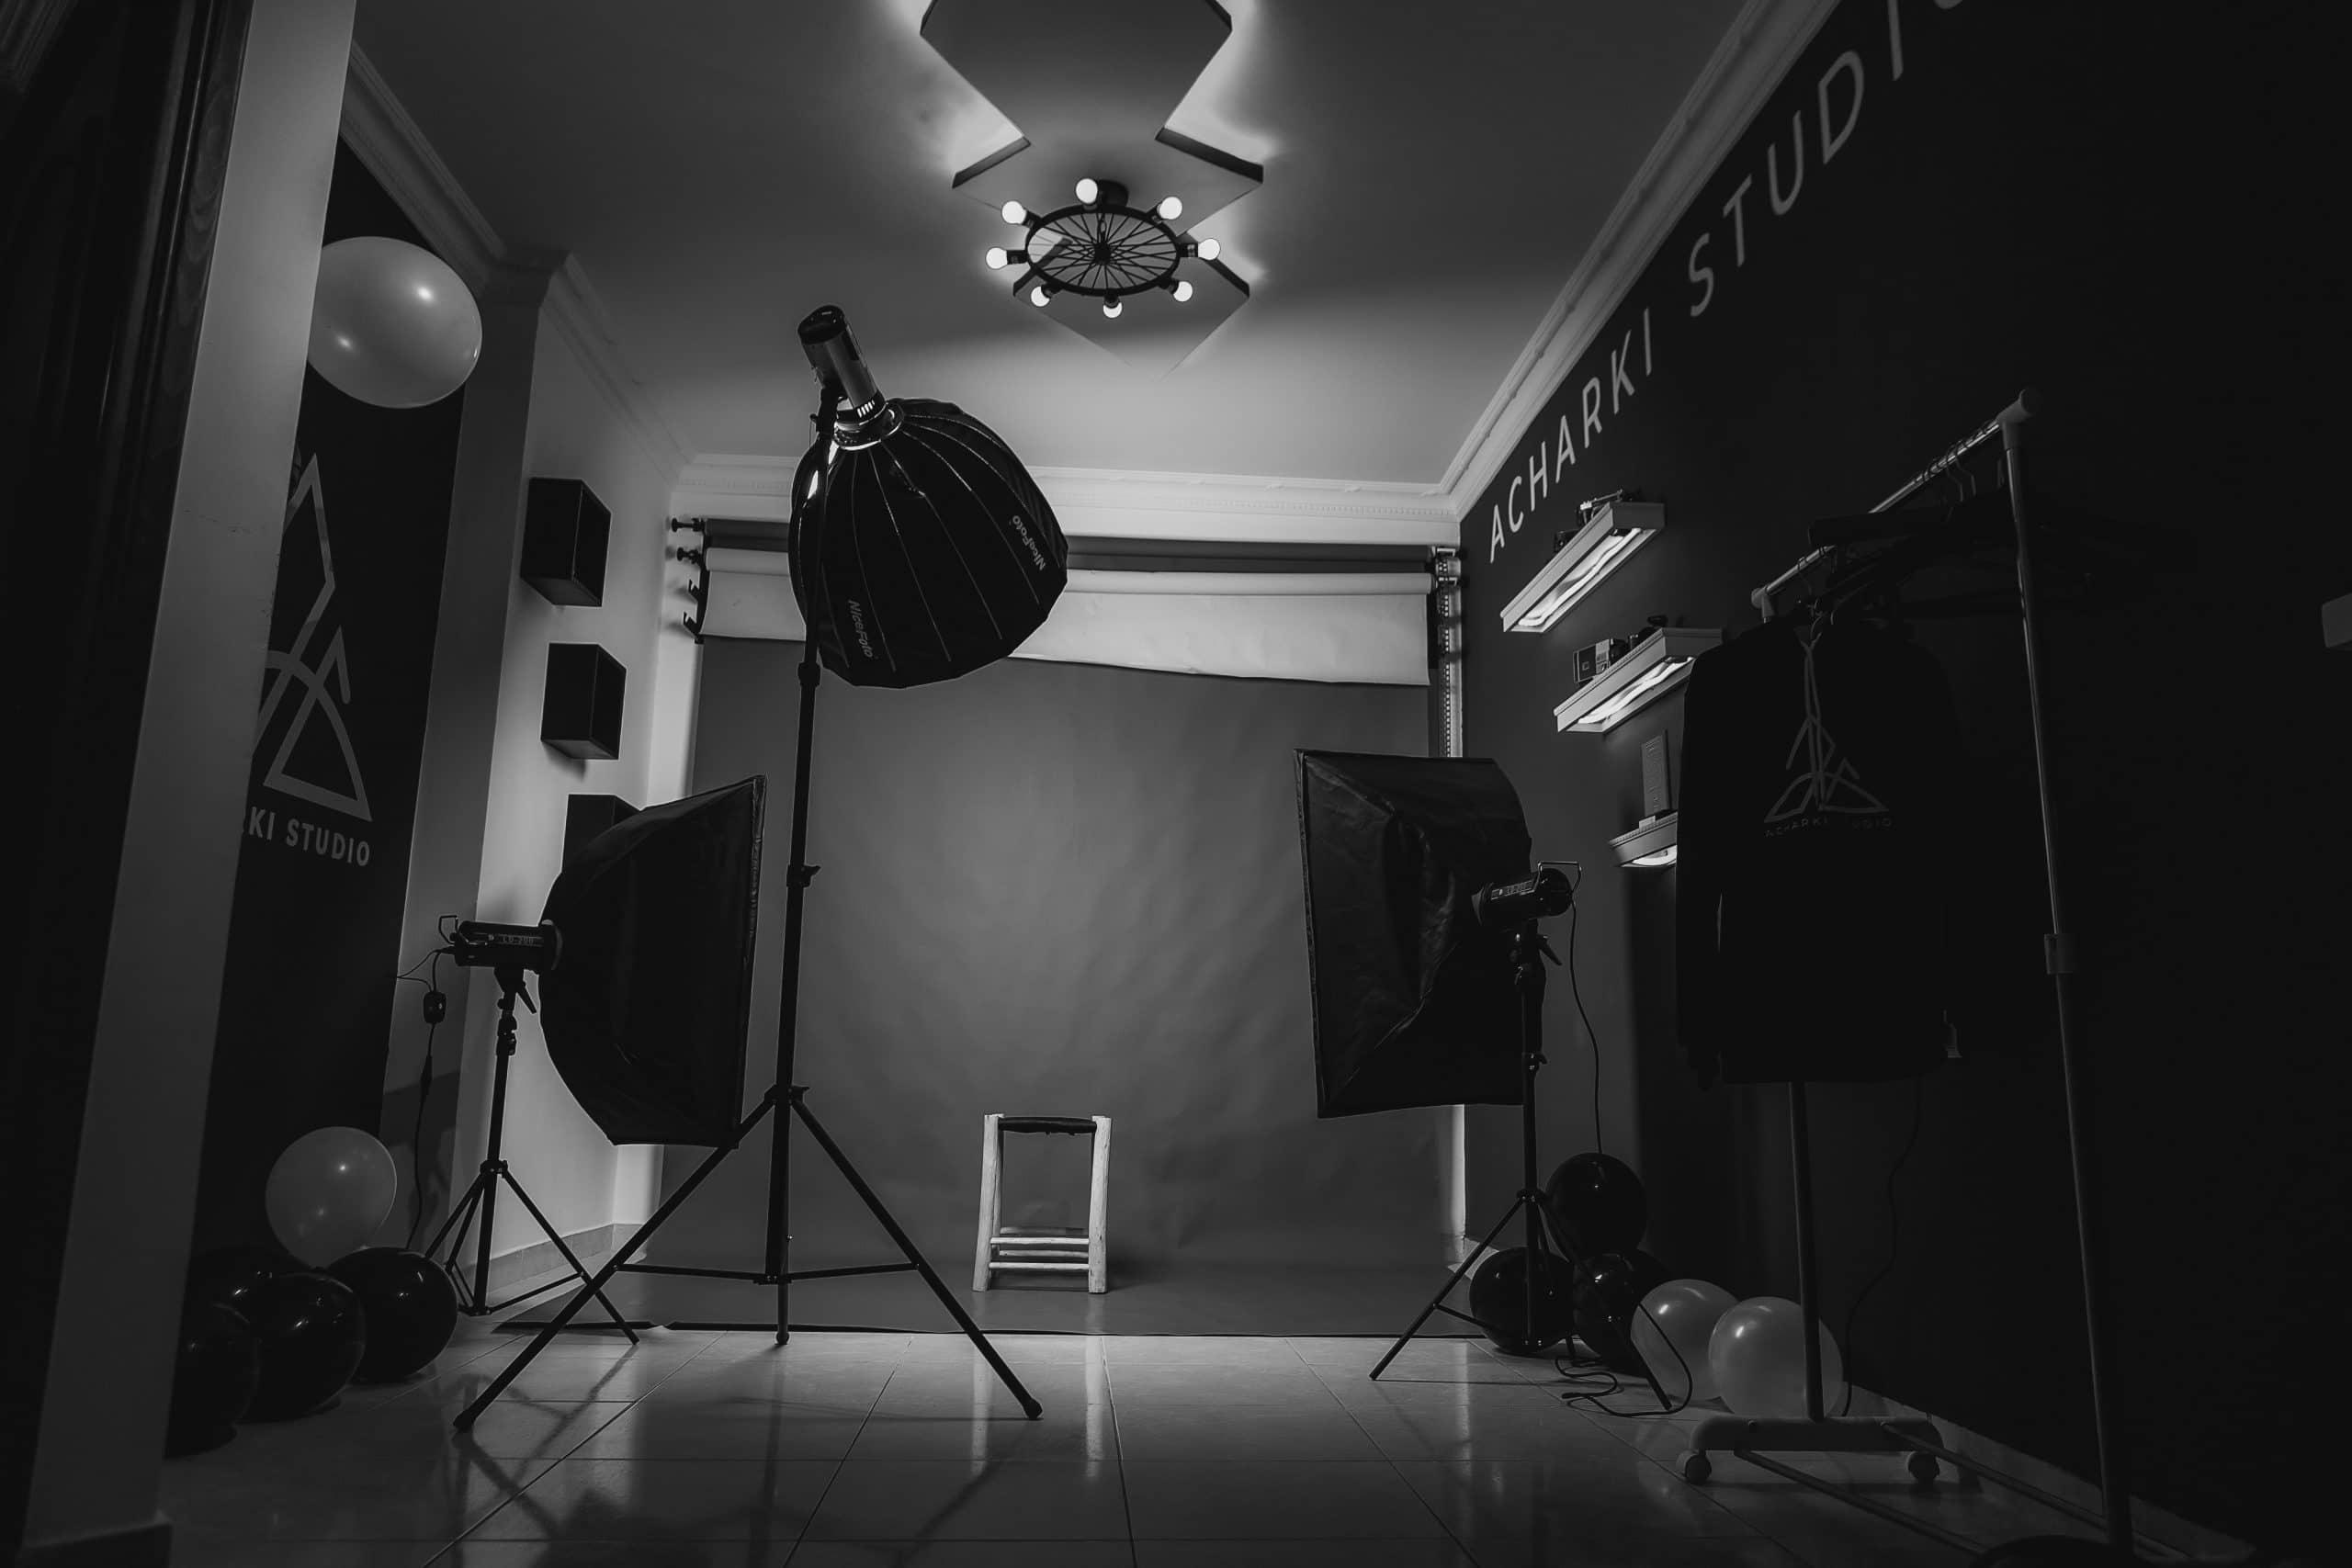 Studio photography equipment - Tips for Studio Photography